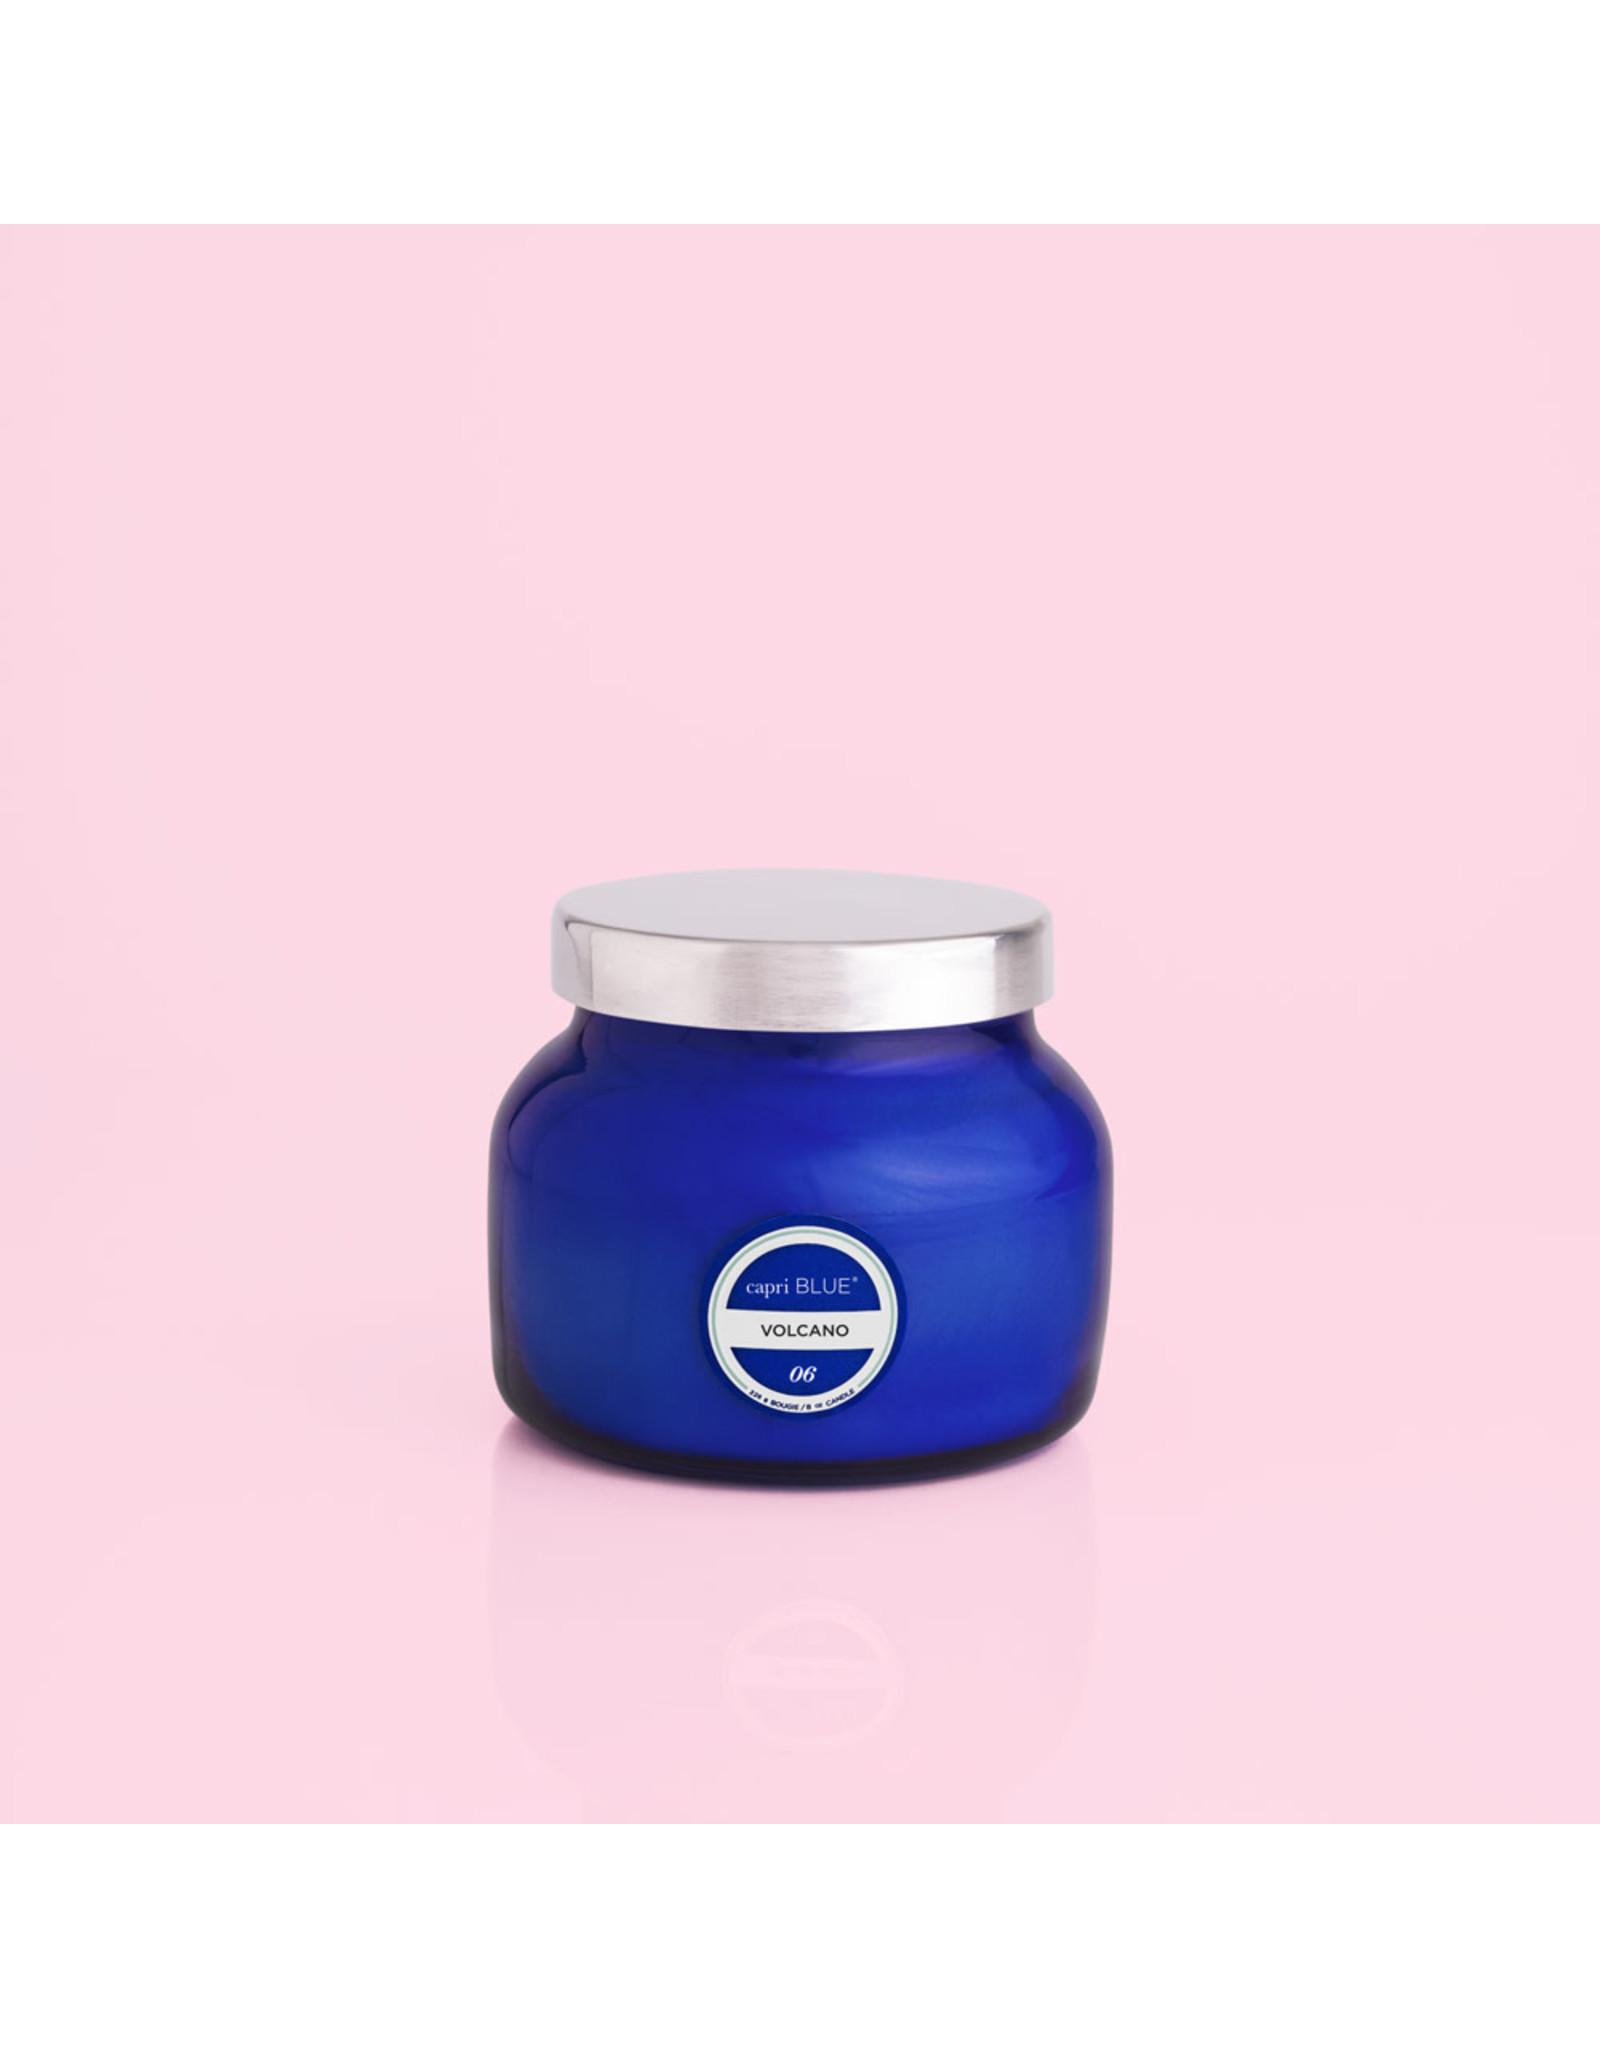 Capri Blue Volcano Signature Petite Jar Candle